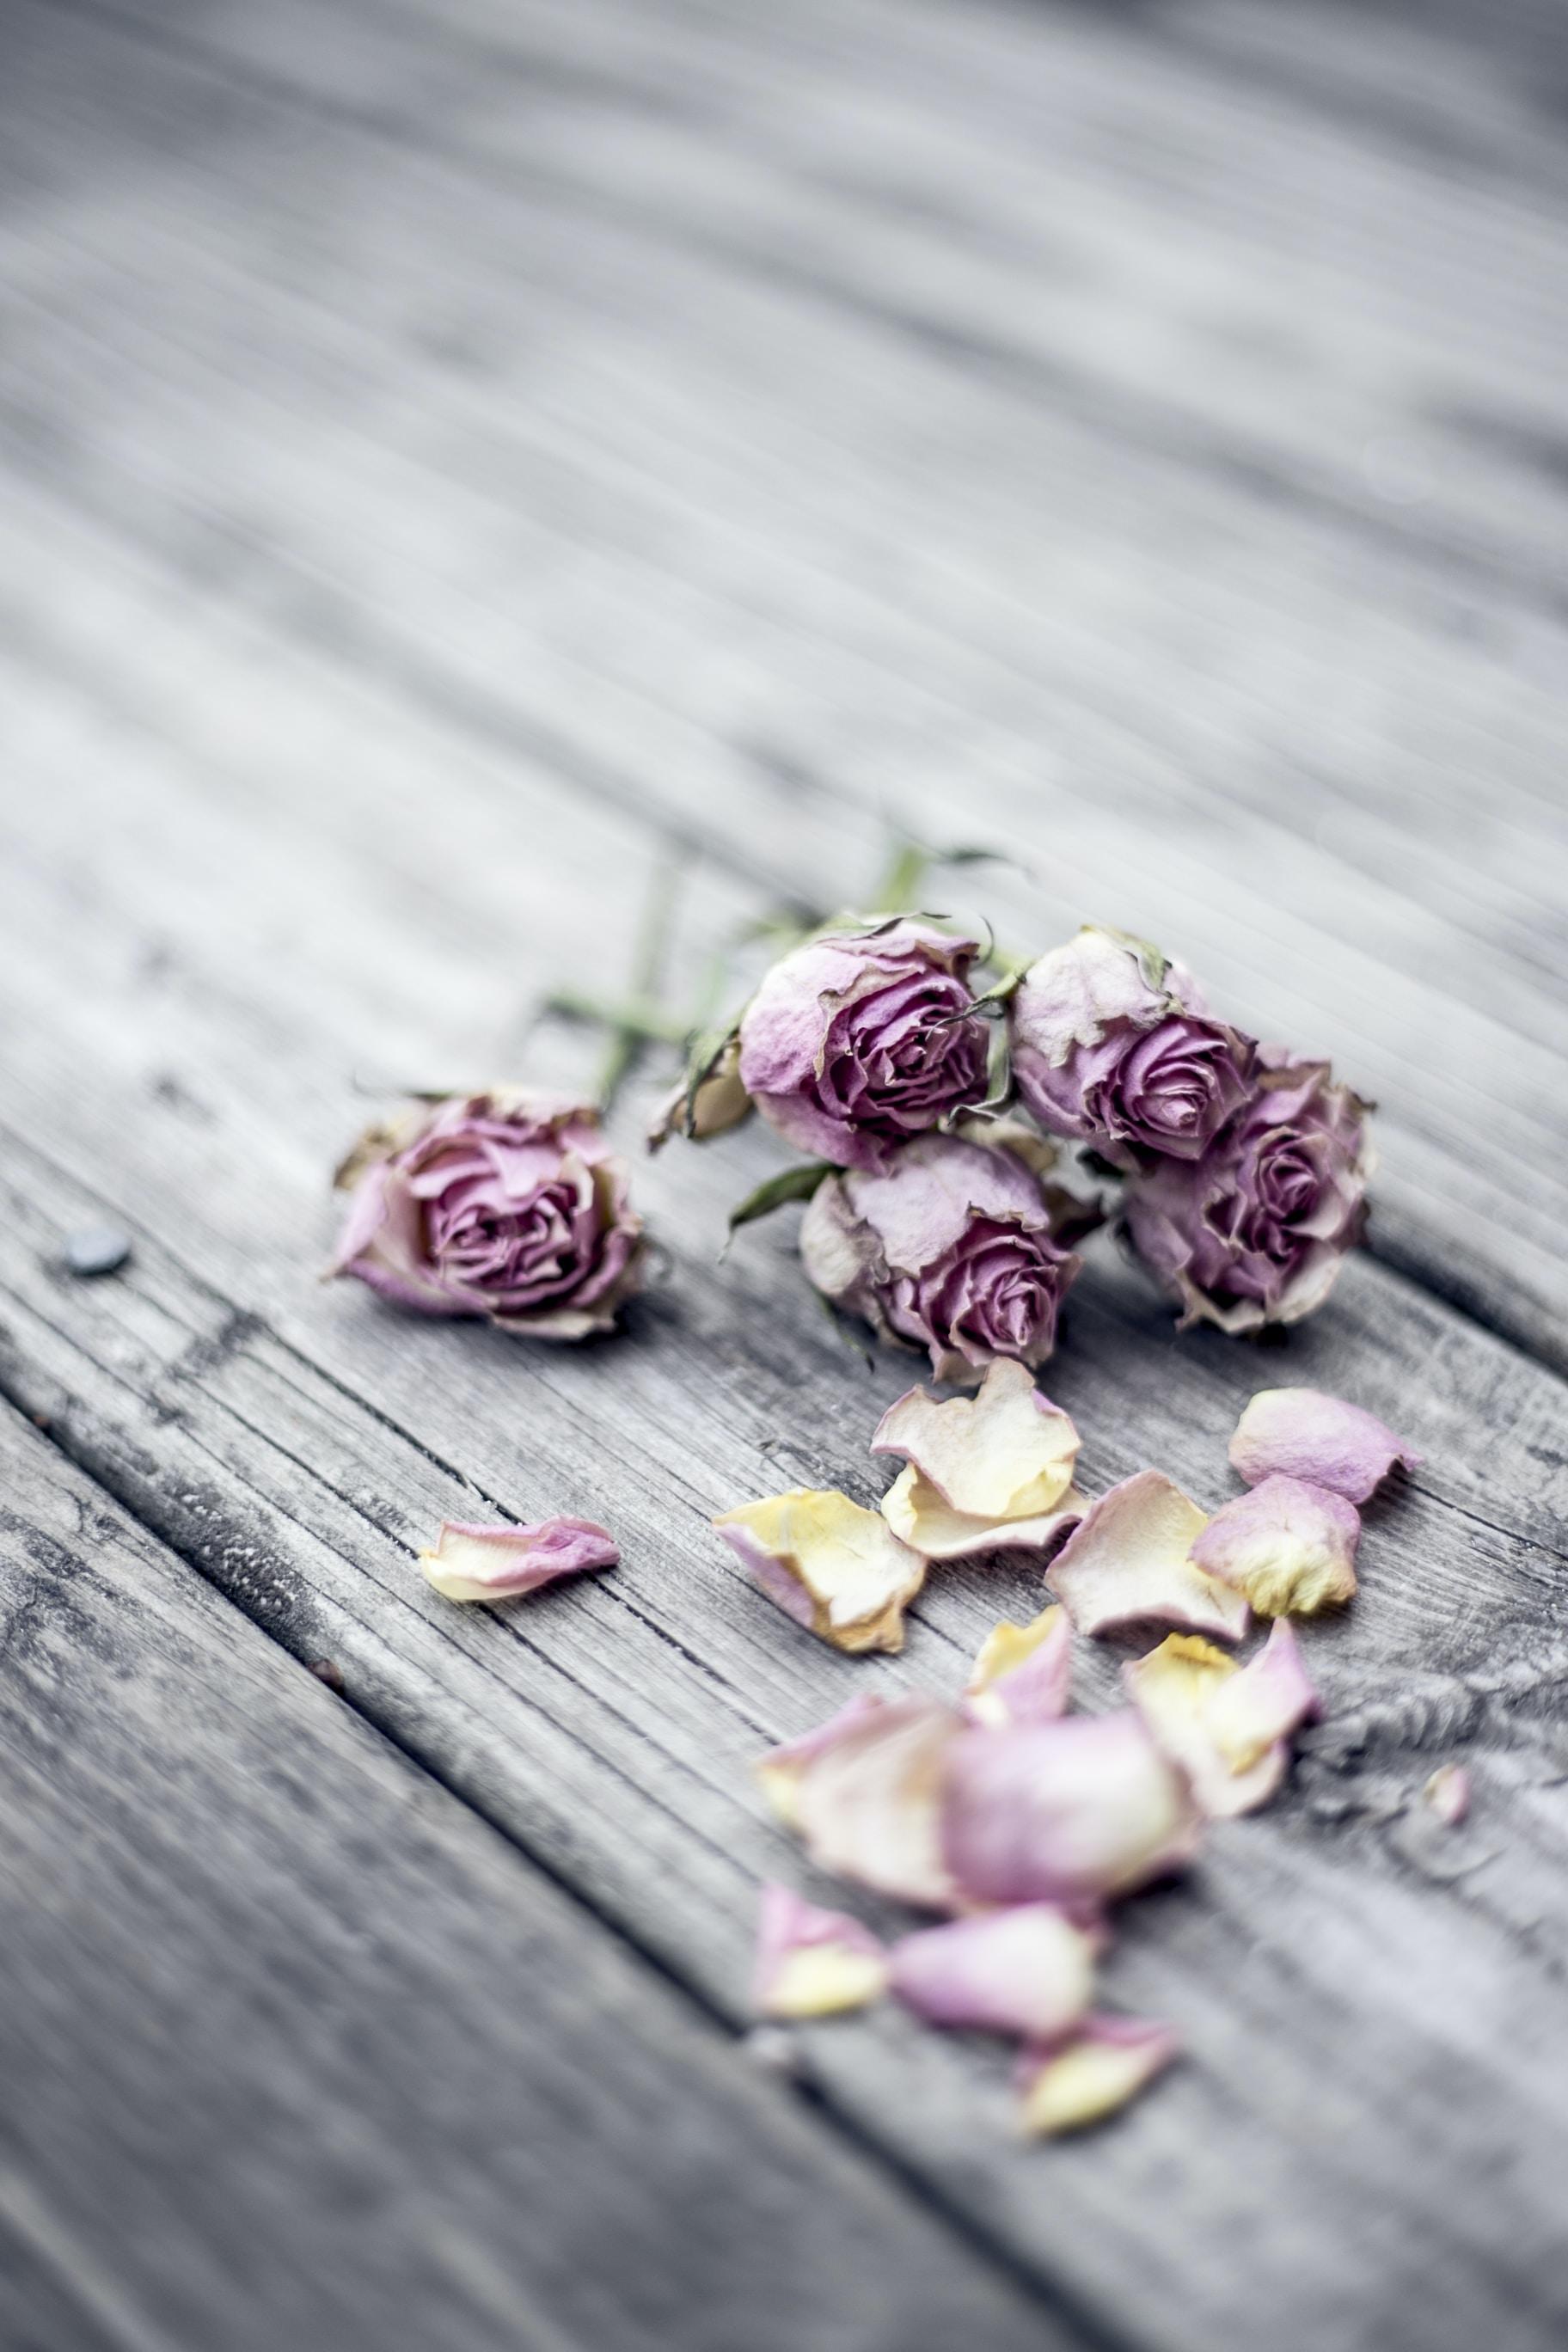 pink rose flowers on gray wooden floor